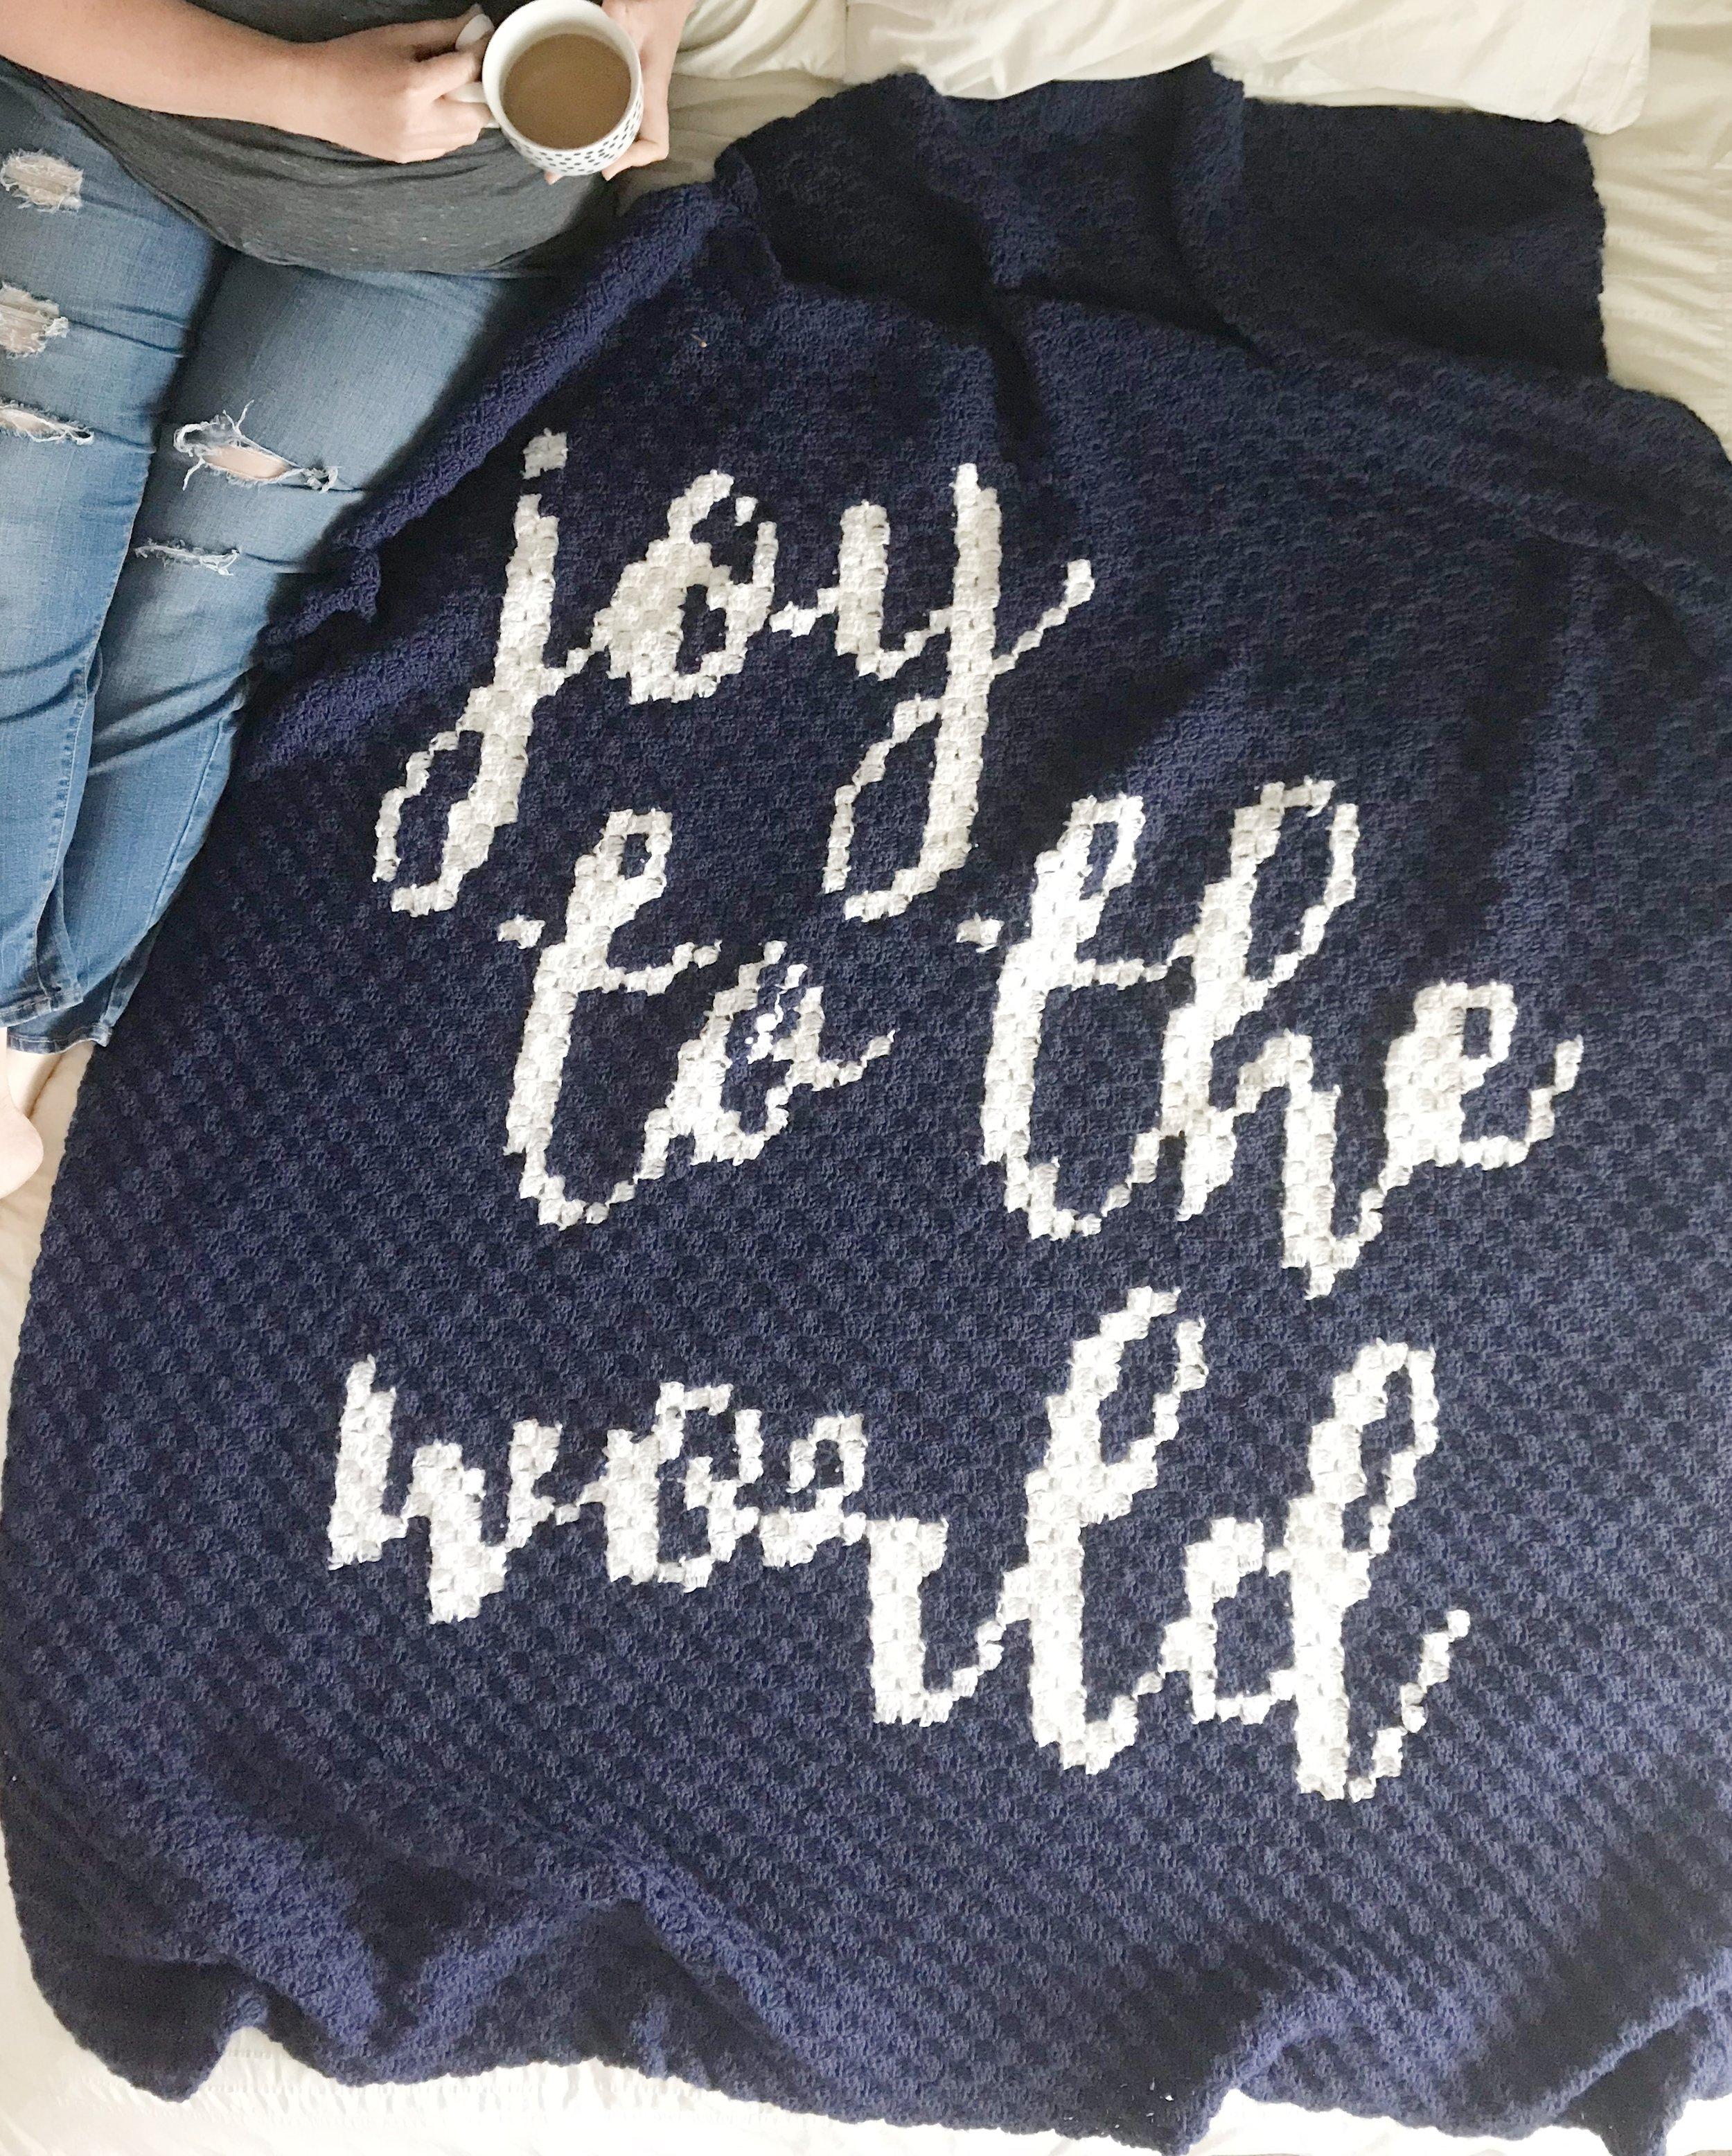 How to make a hacky sack | Shiny Happy World | 1245x1000